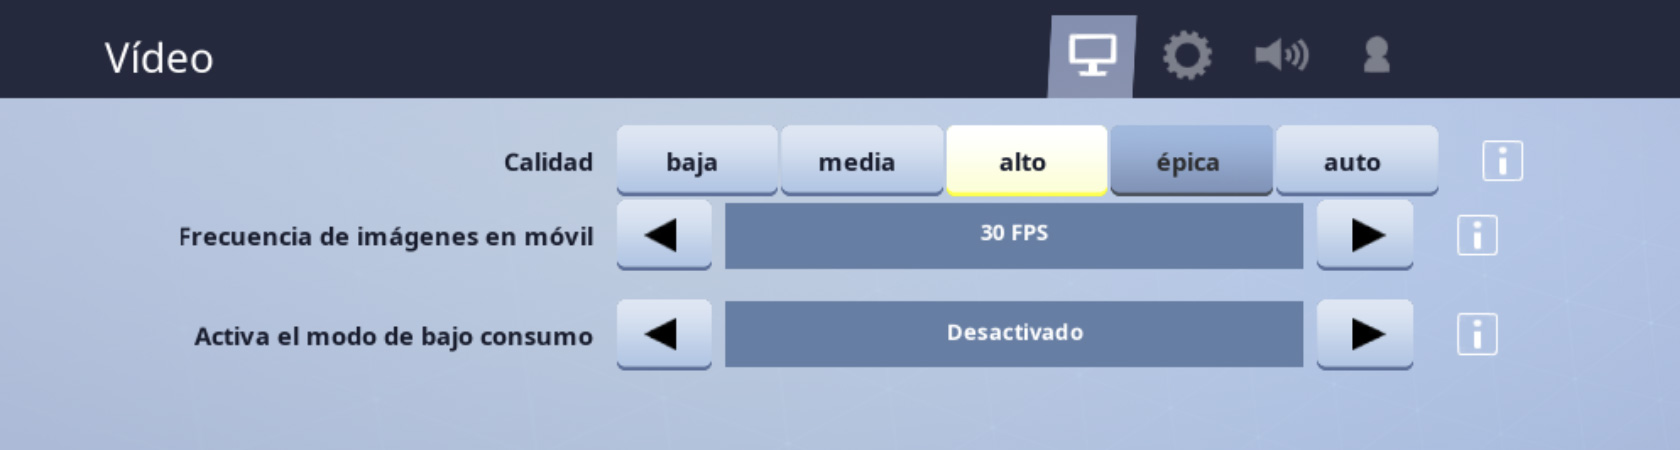 Opciones de video de Fortnite en el iPhone